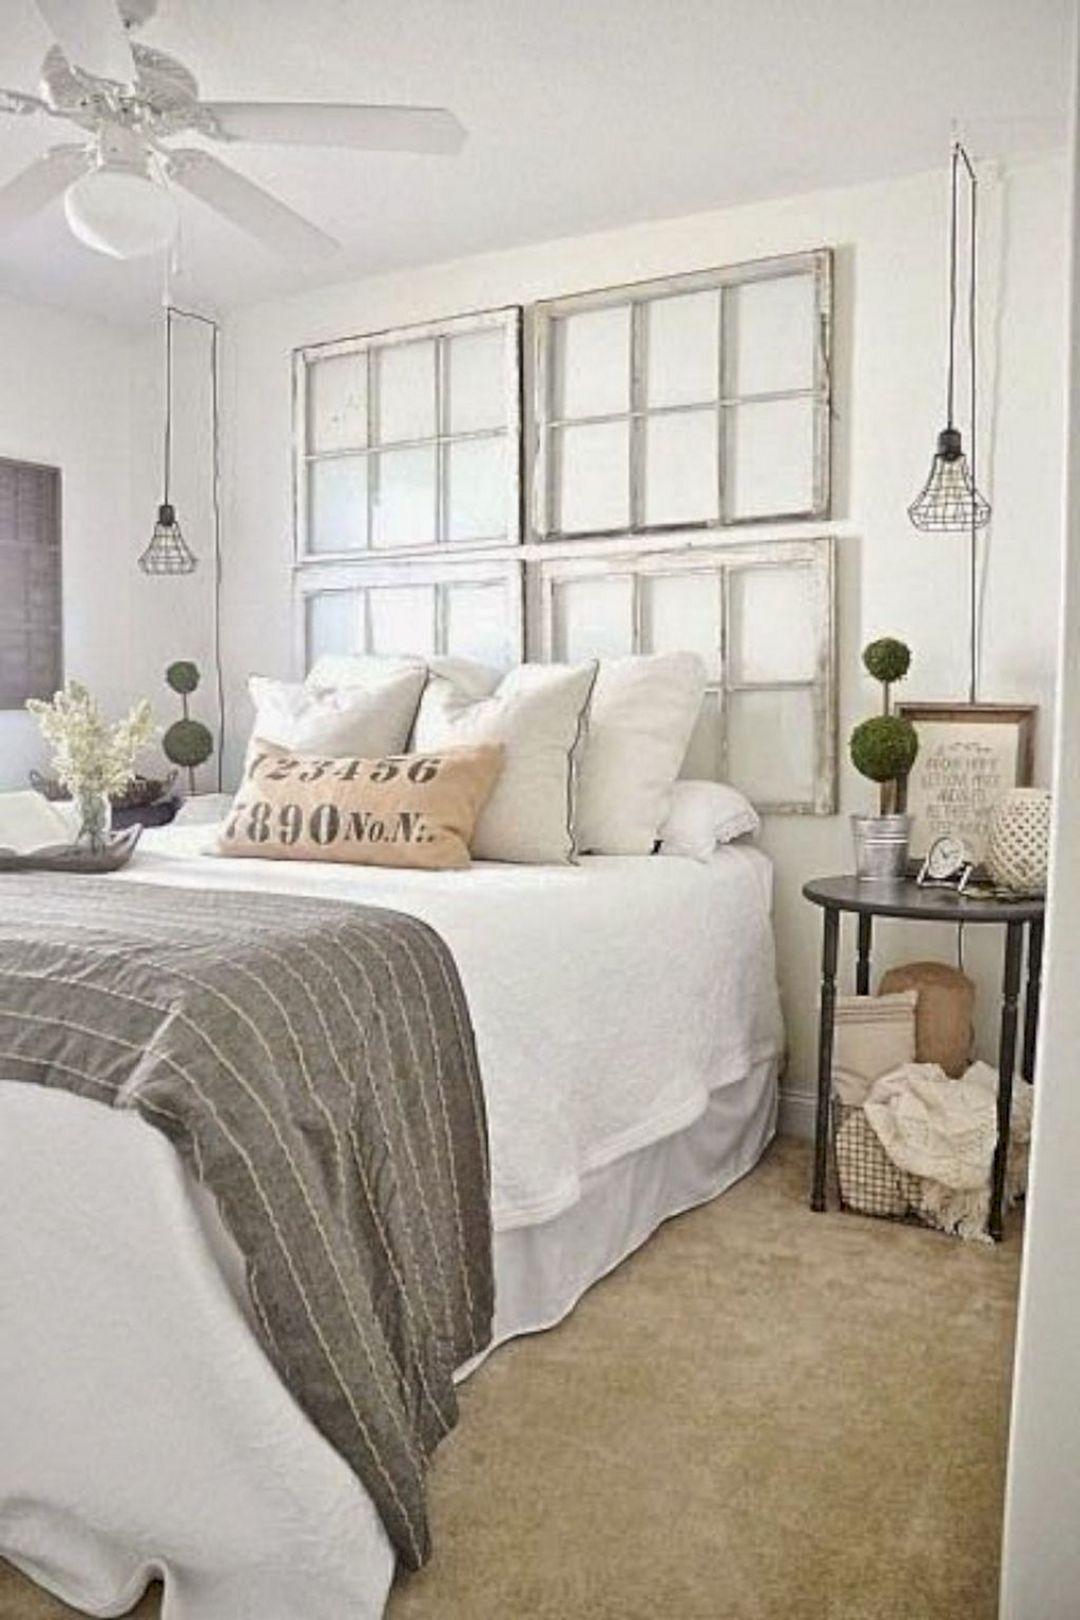 Farmhouse Master Bedroom Design 23 (Farmhouse Master ...